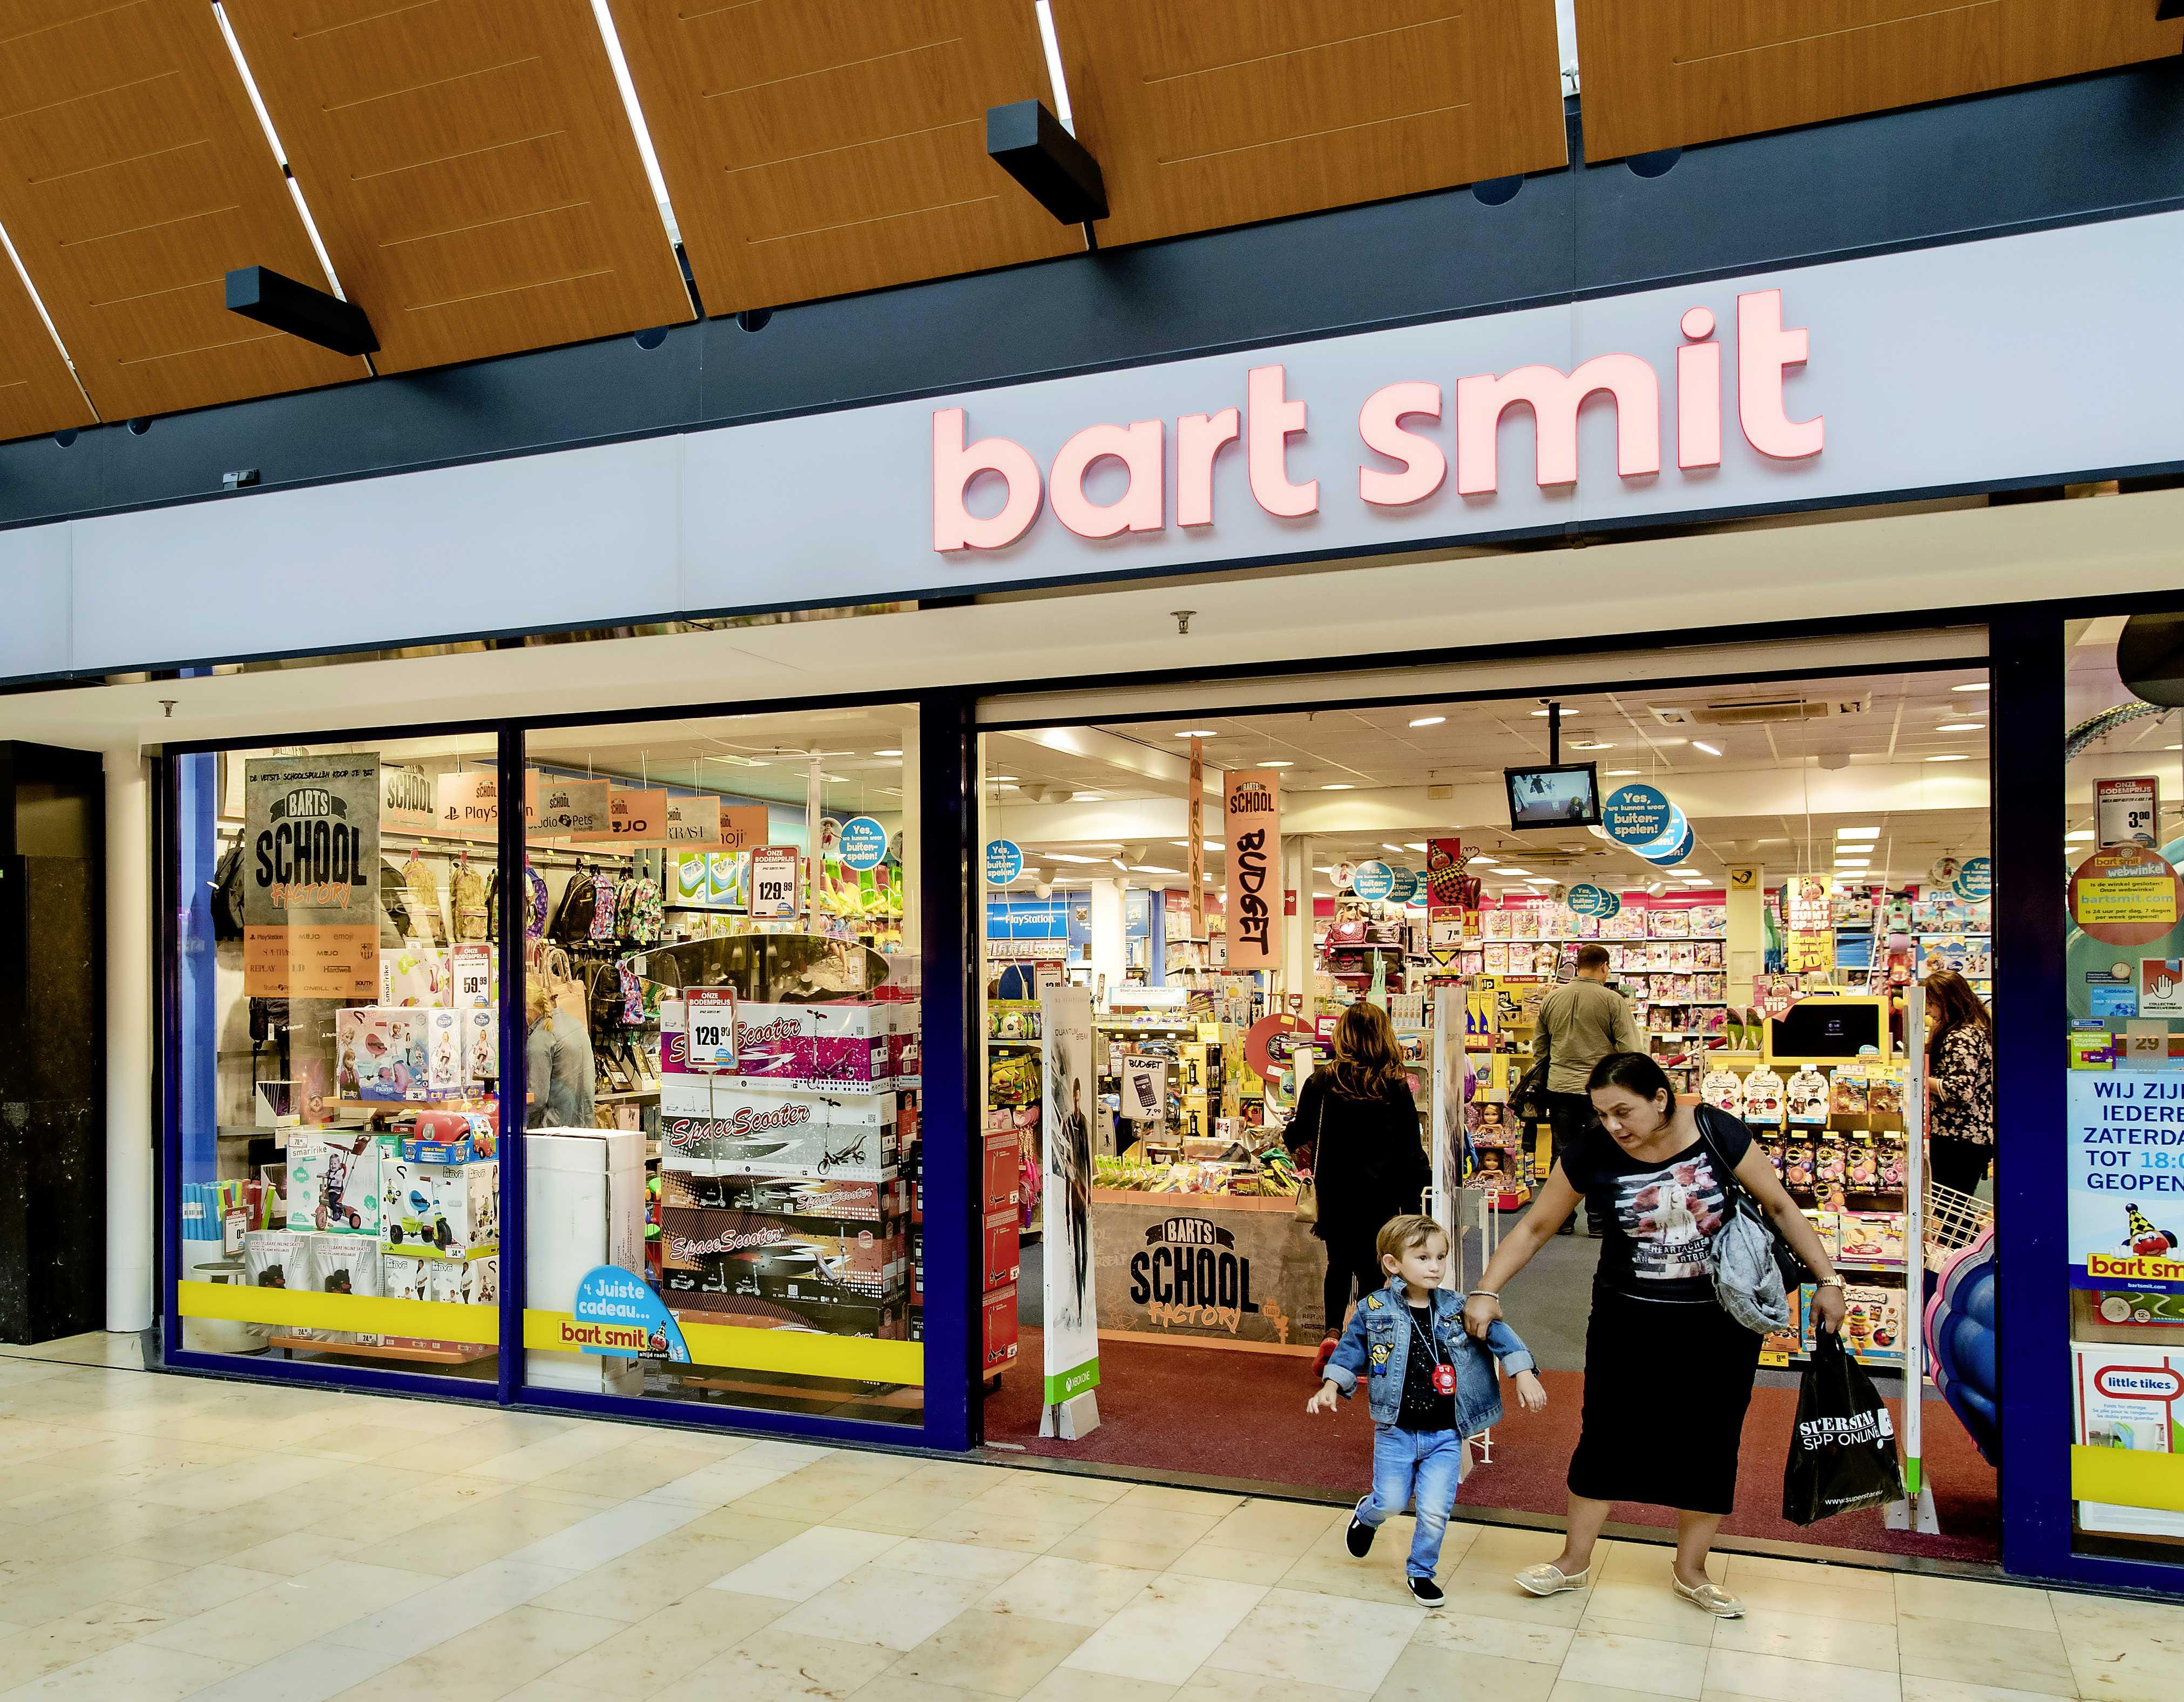 Maxi Toys Koopt Bart Smit België Financieel Telegraafnl